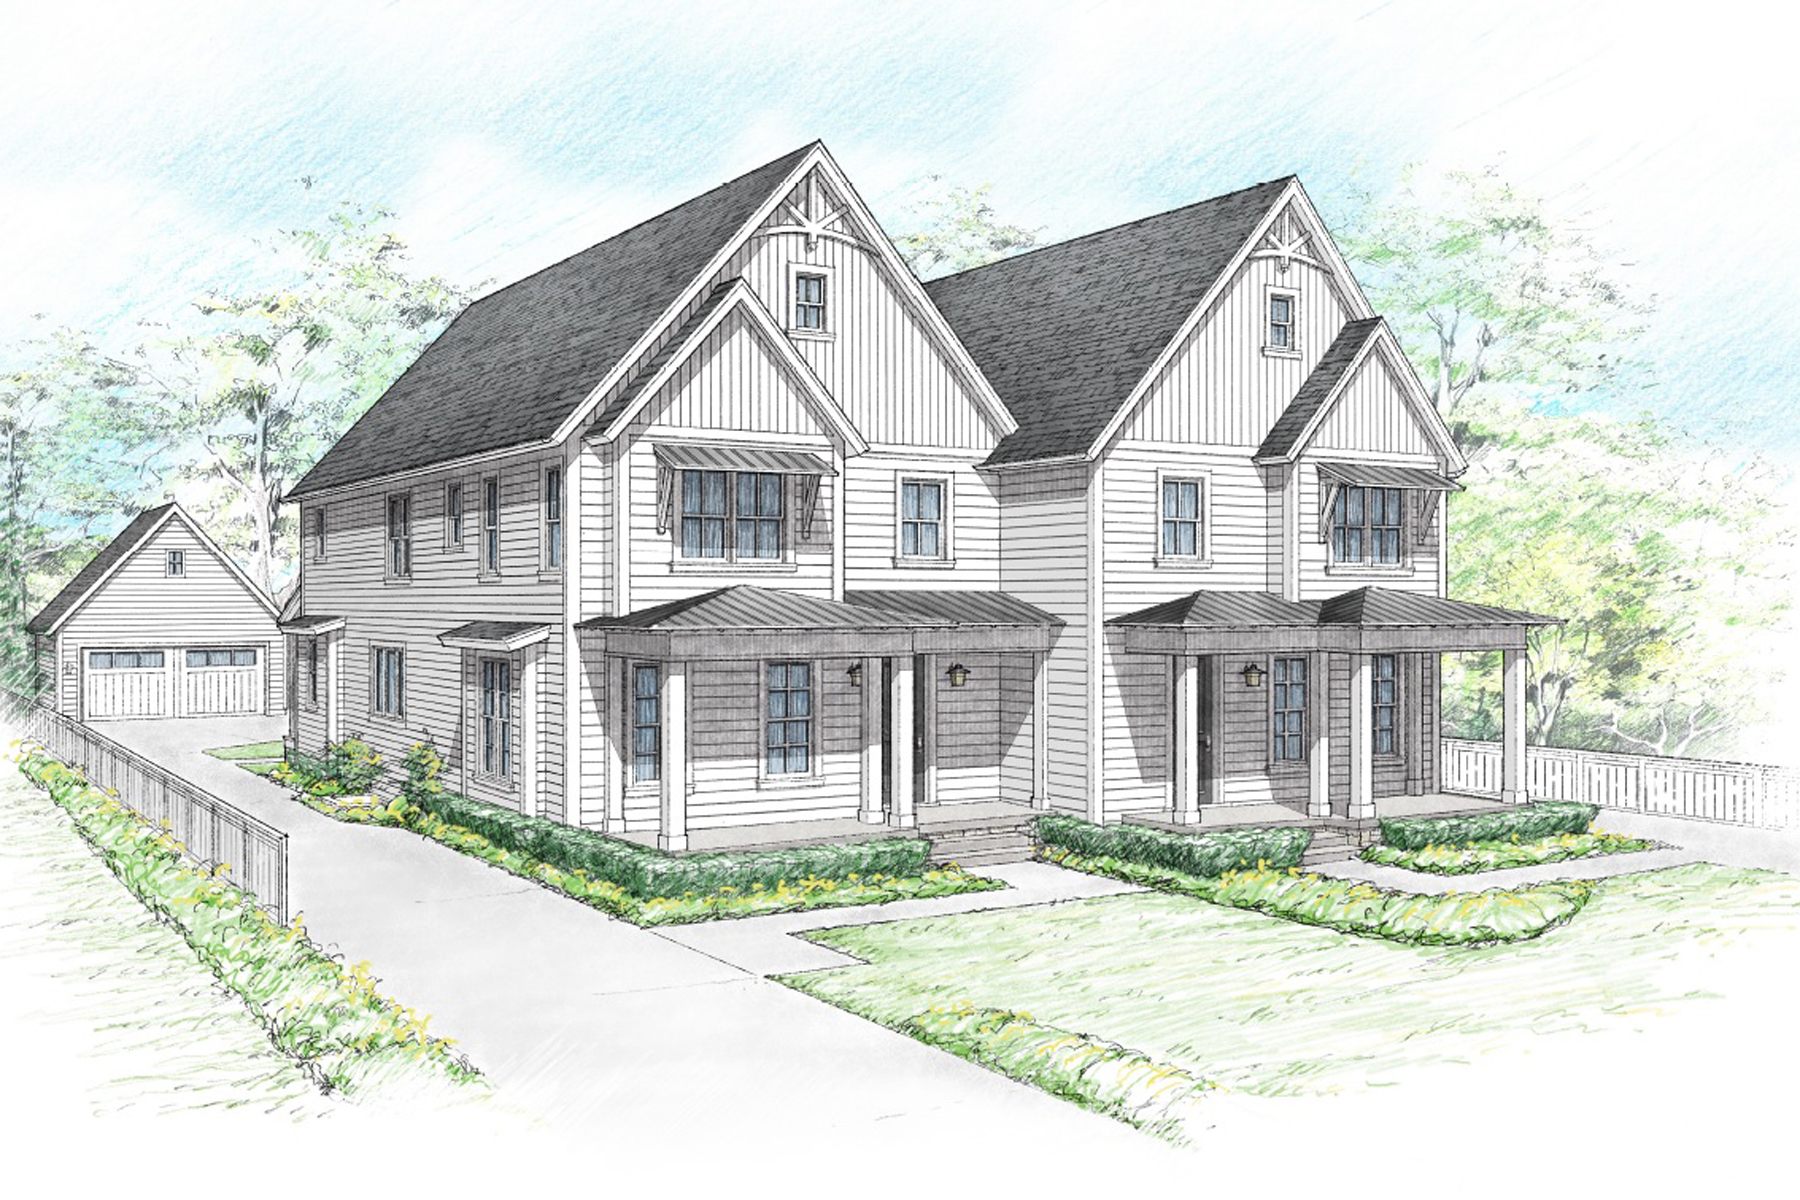 Single Family Home for Sale at Birmingham 887 Redding Road, Birmingham, Michigan, 48009 United States